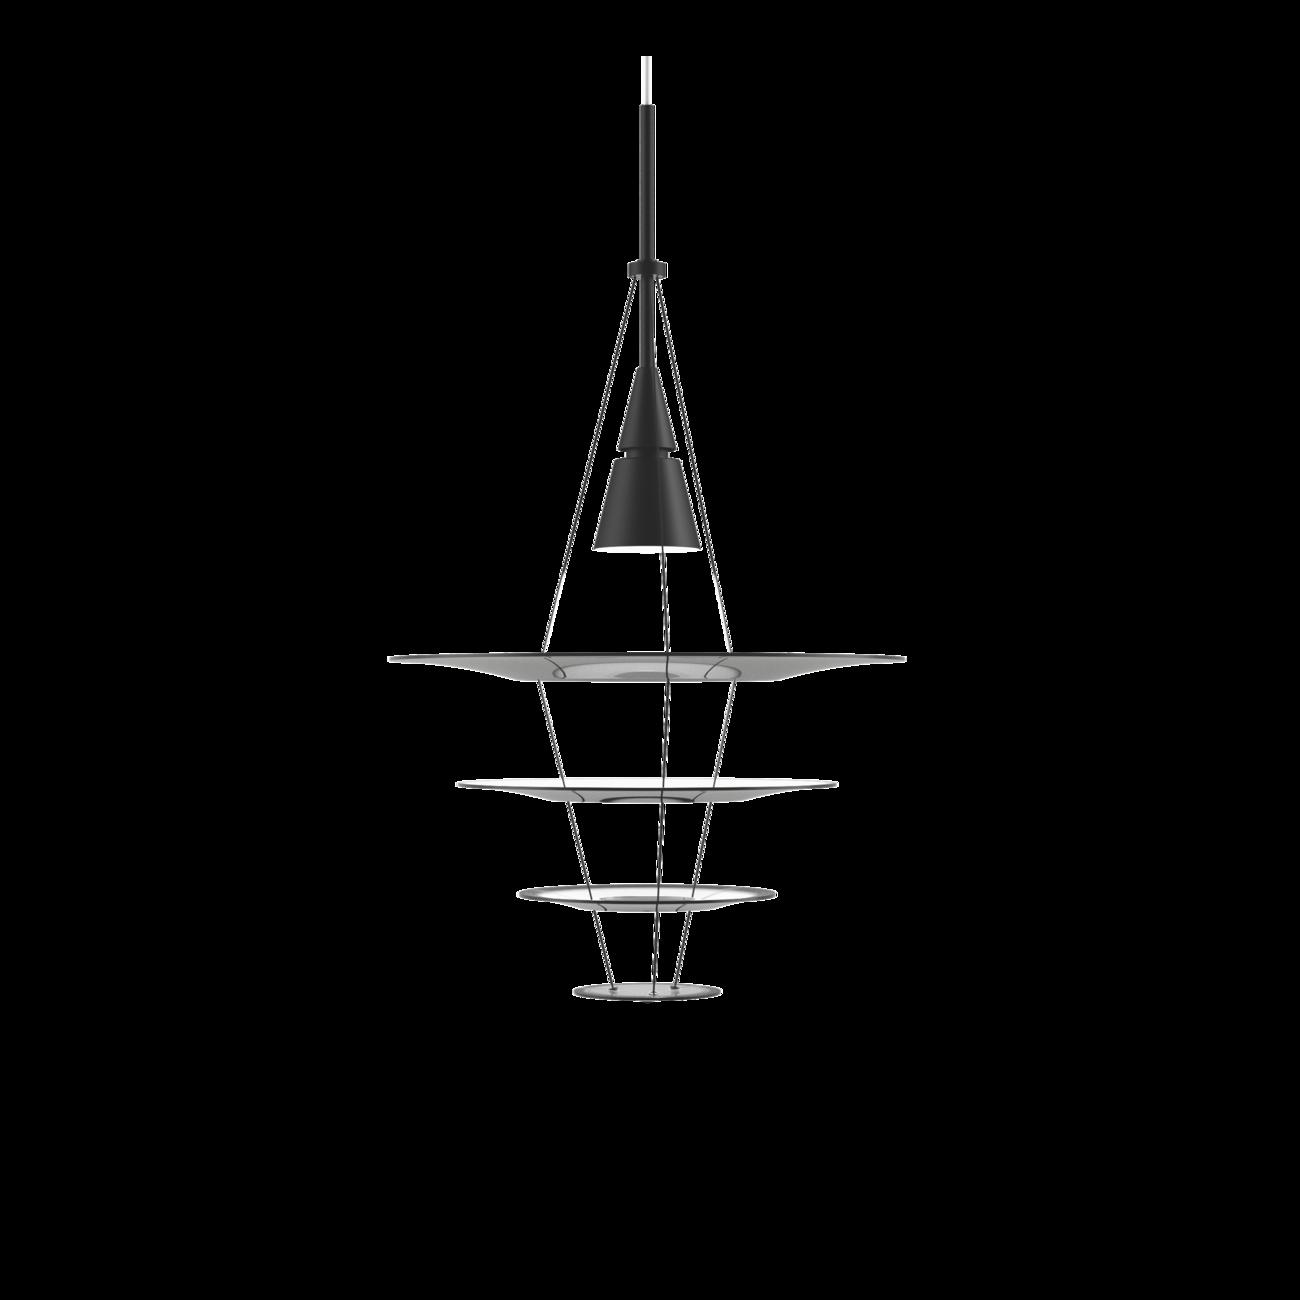 Louis Poulsen Enigma Ø 425 hanglamp Zwart